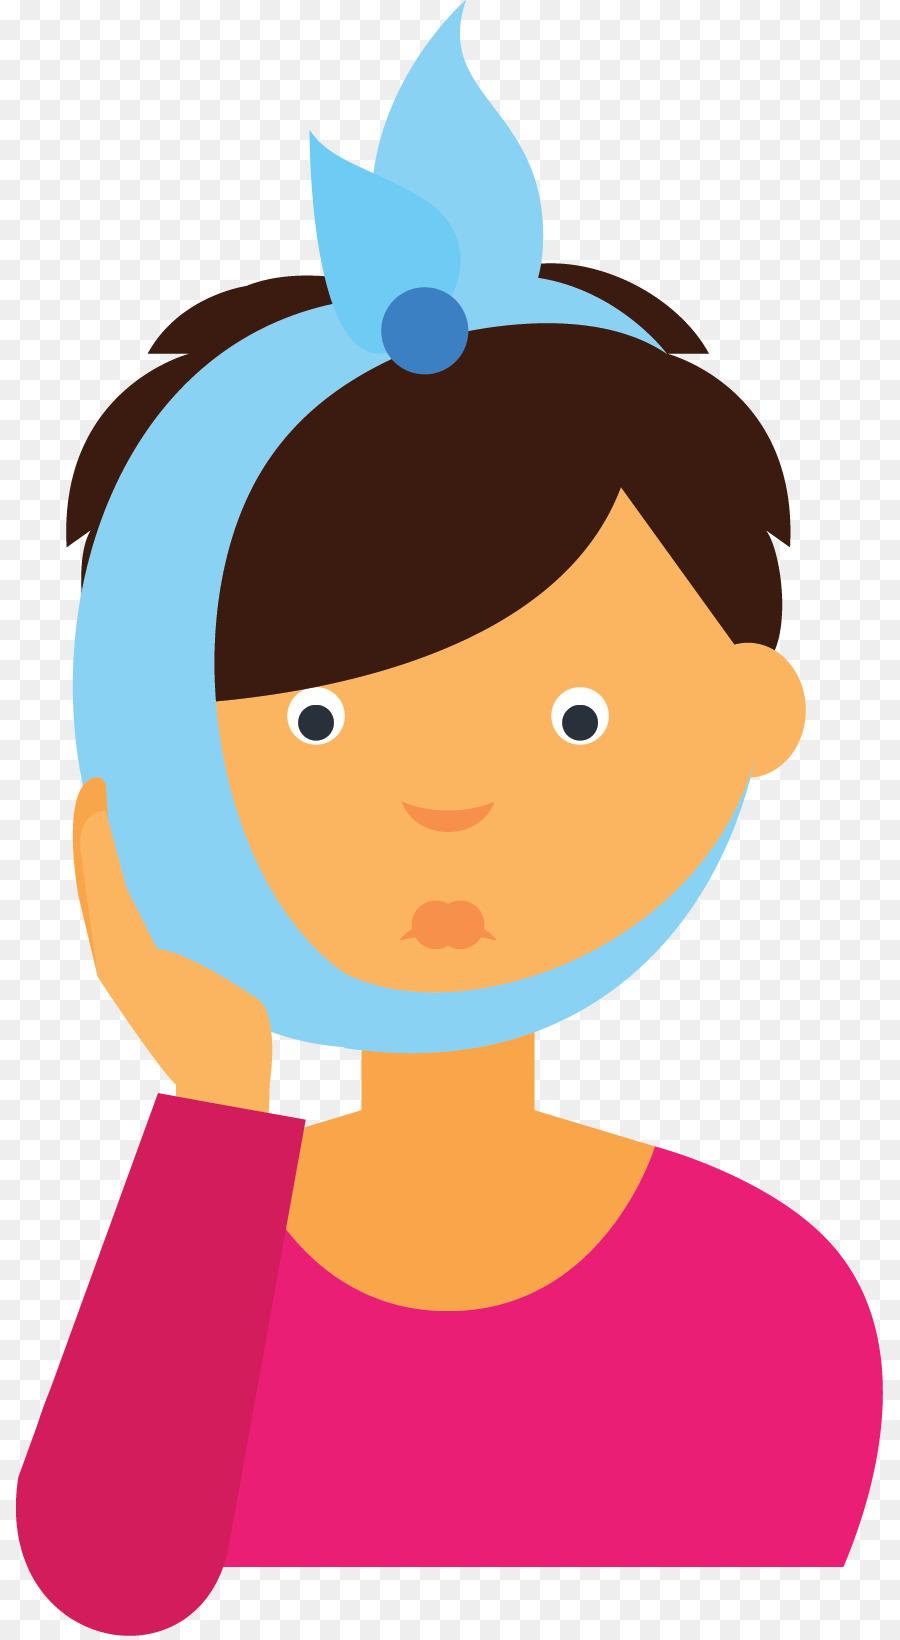 Toothache Gums Clip art - sick - Sick Girl In Bed PNG